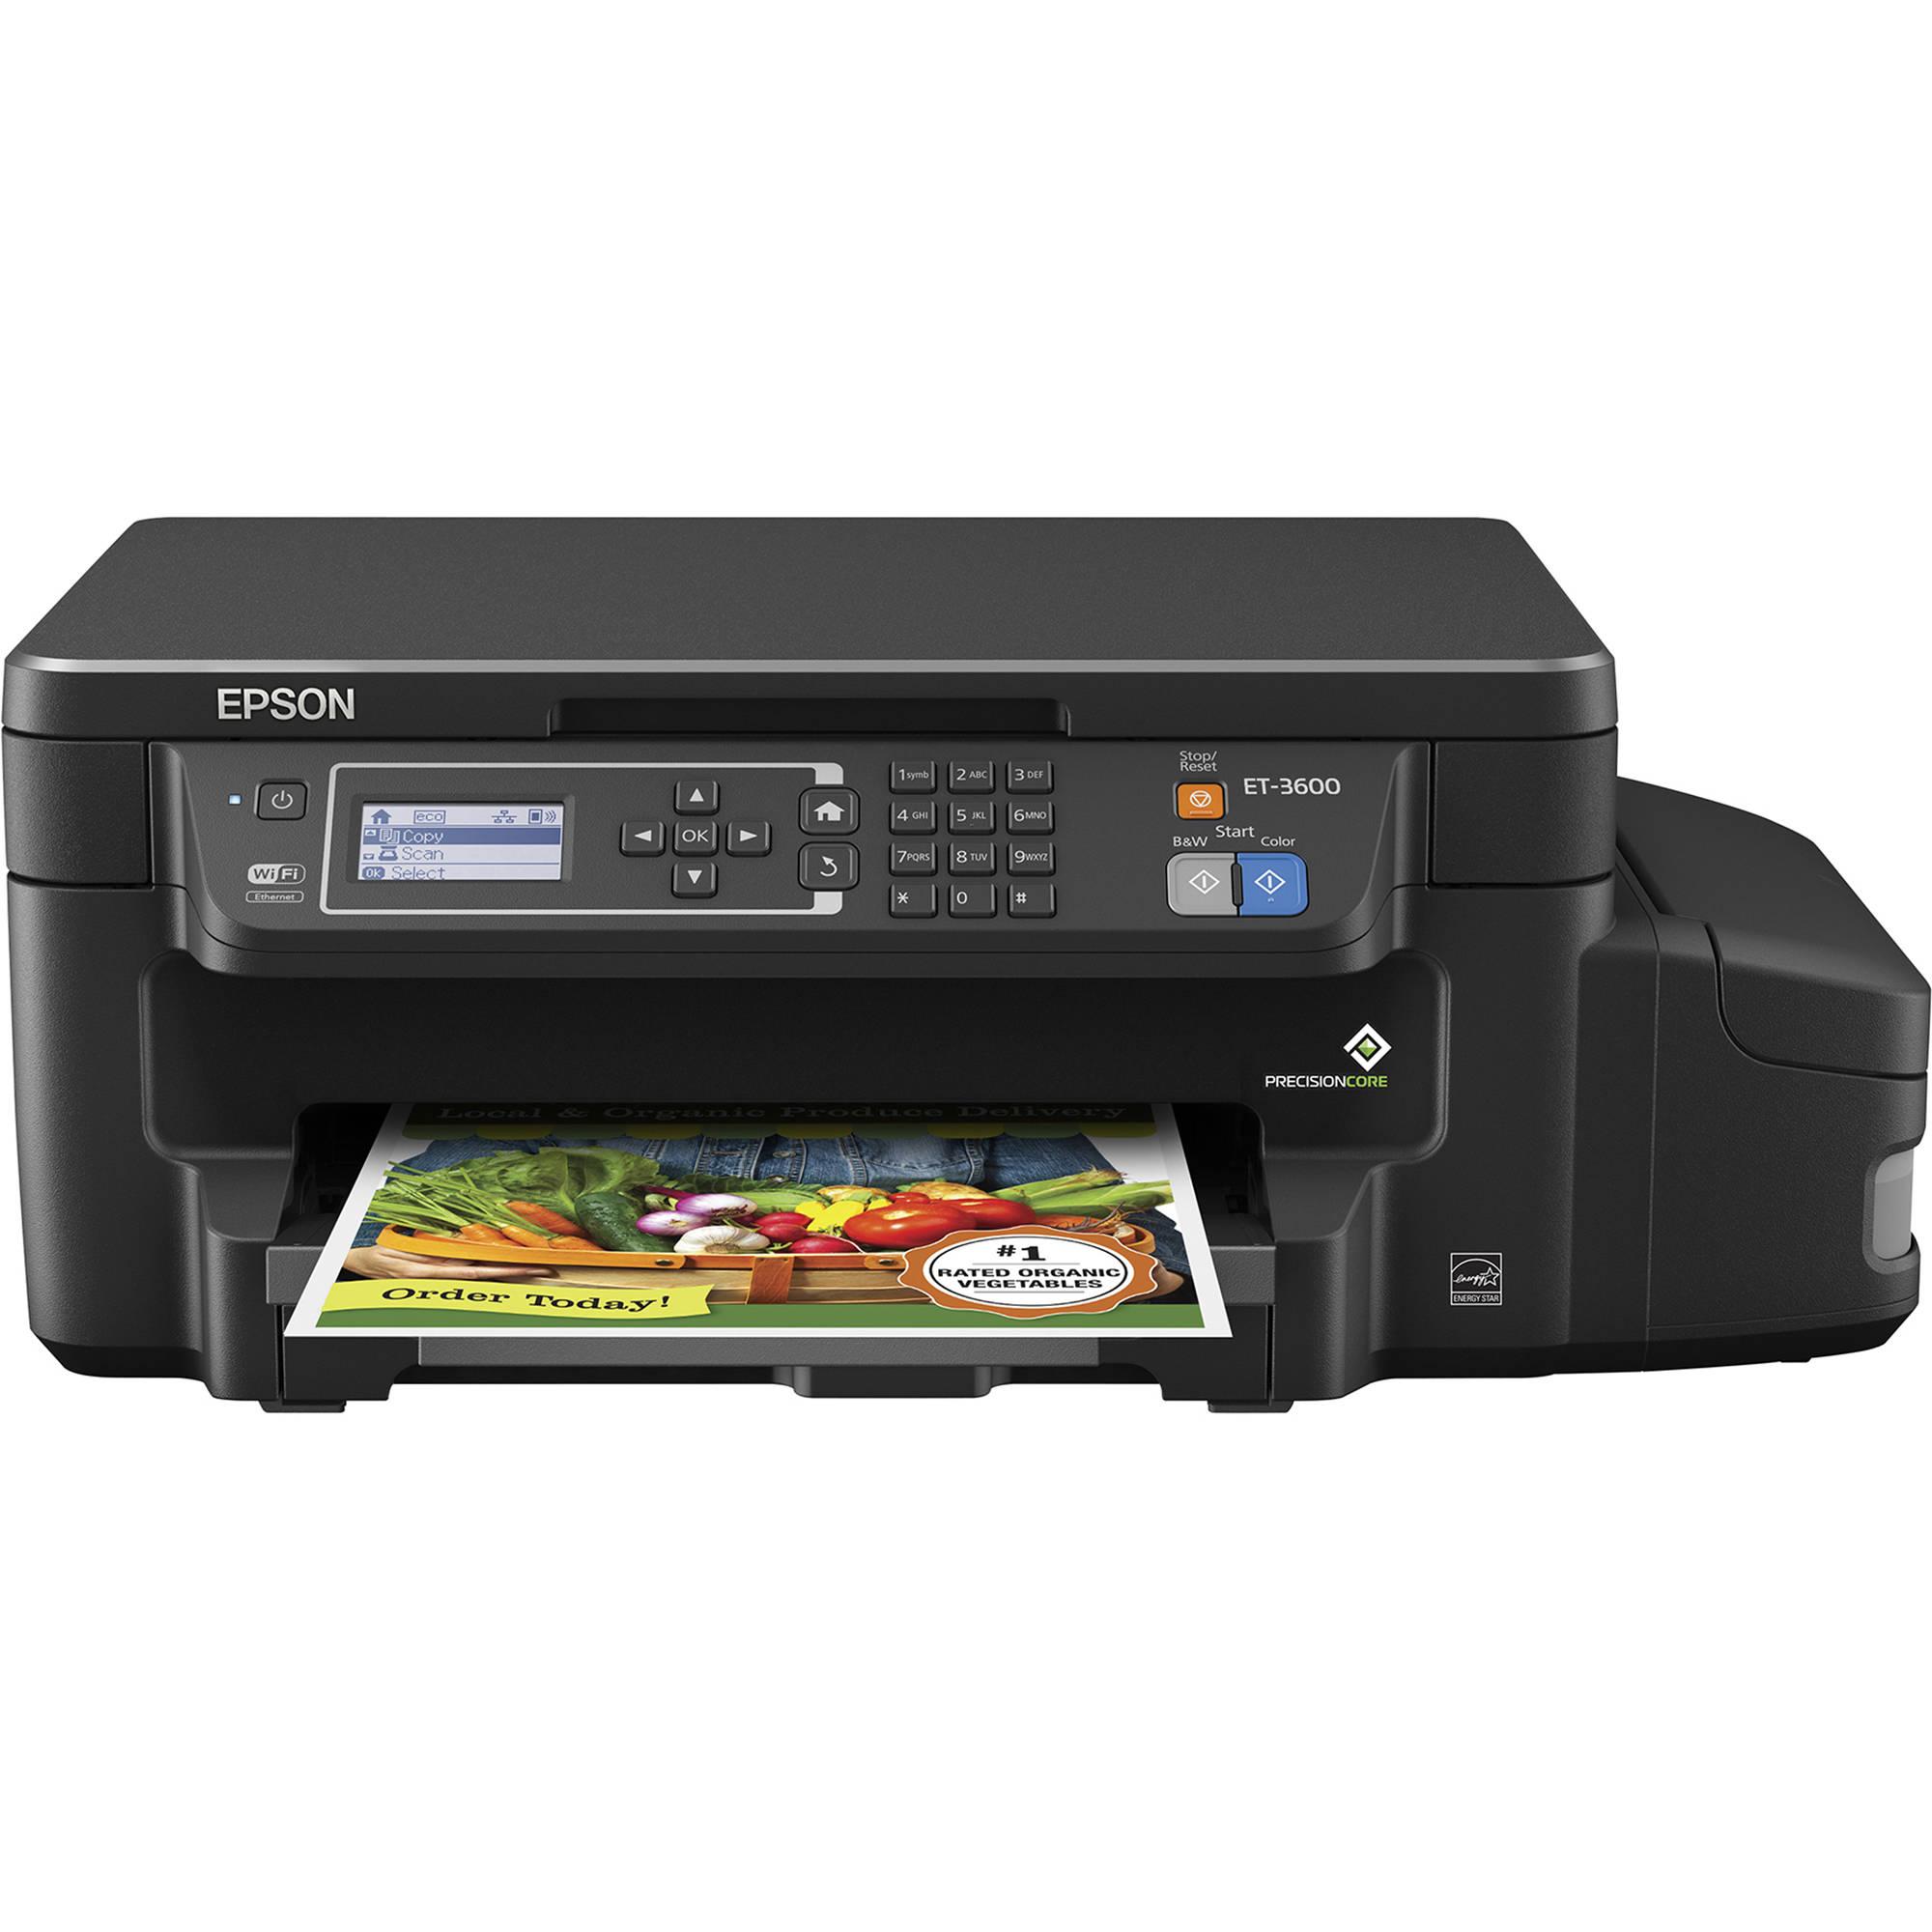 Epson Expression ET-3600 EcoTank All-in-One Inkjet Printer